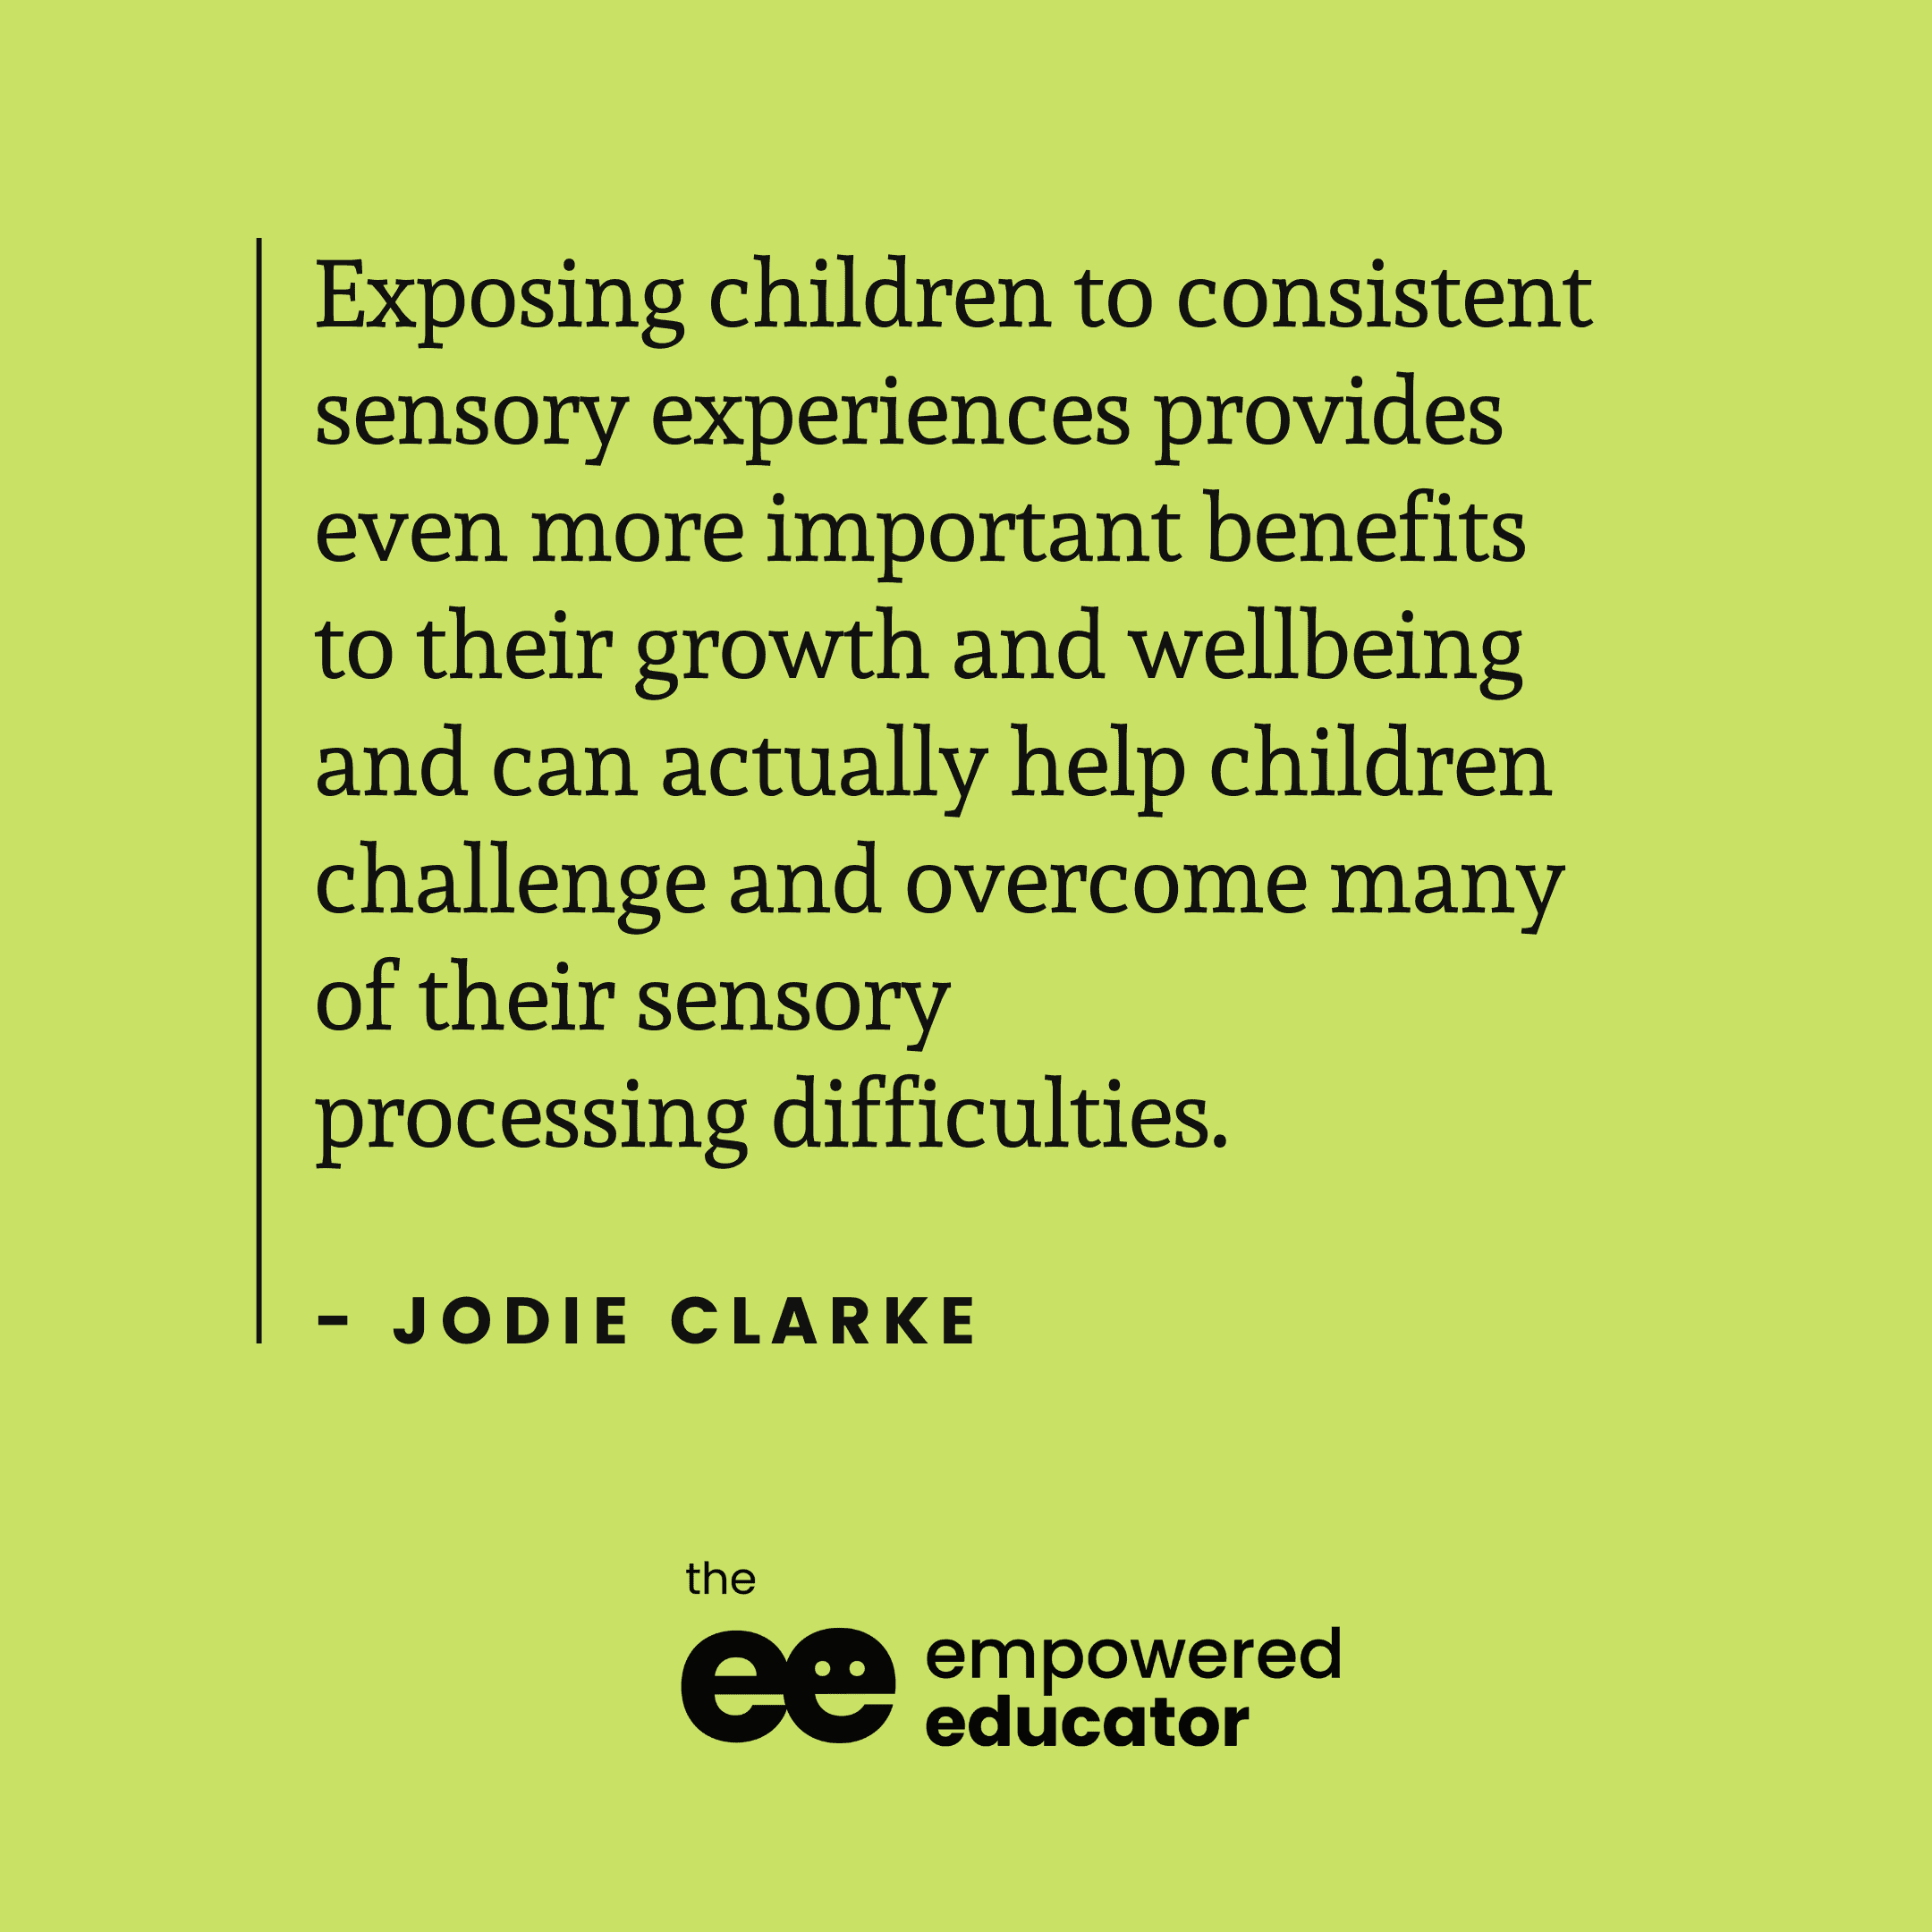 Exposing children to consistent sensory experiences